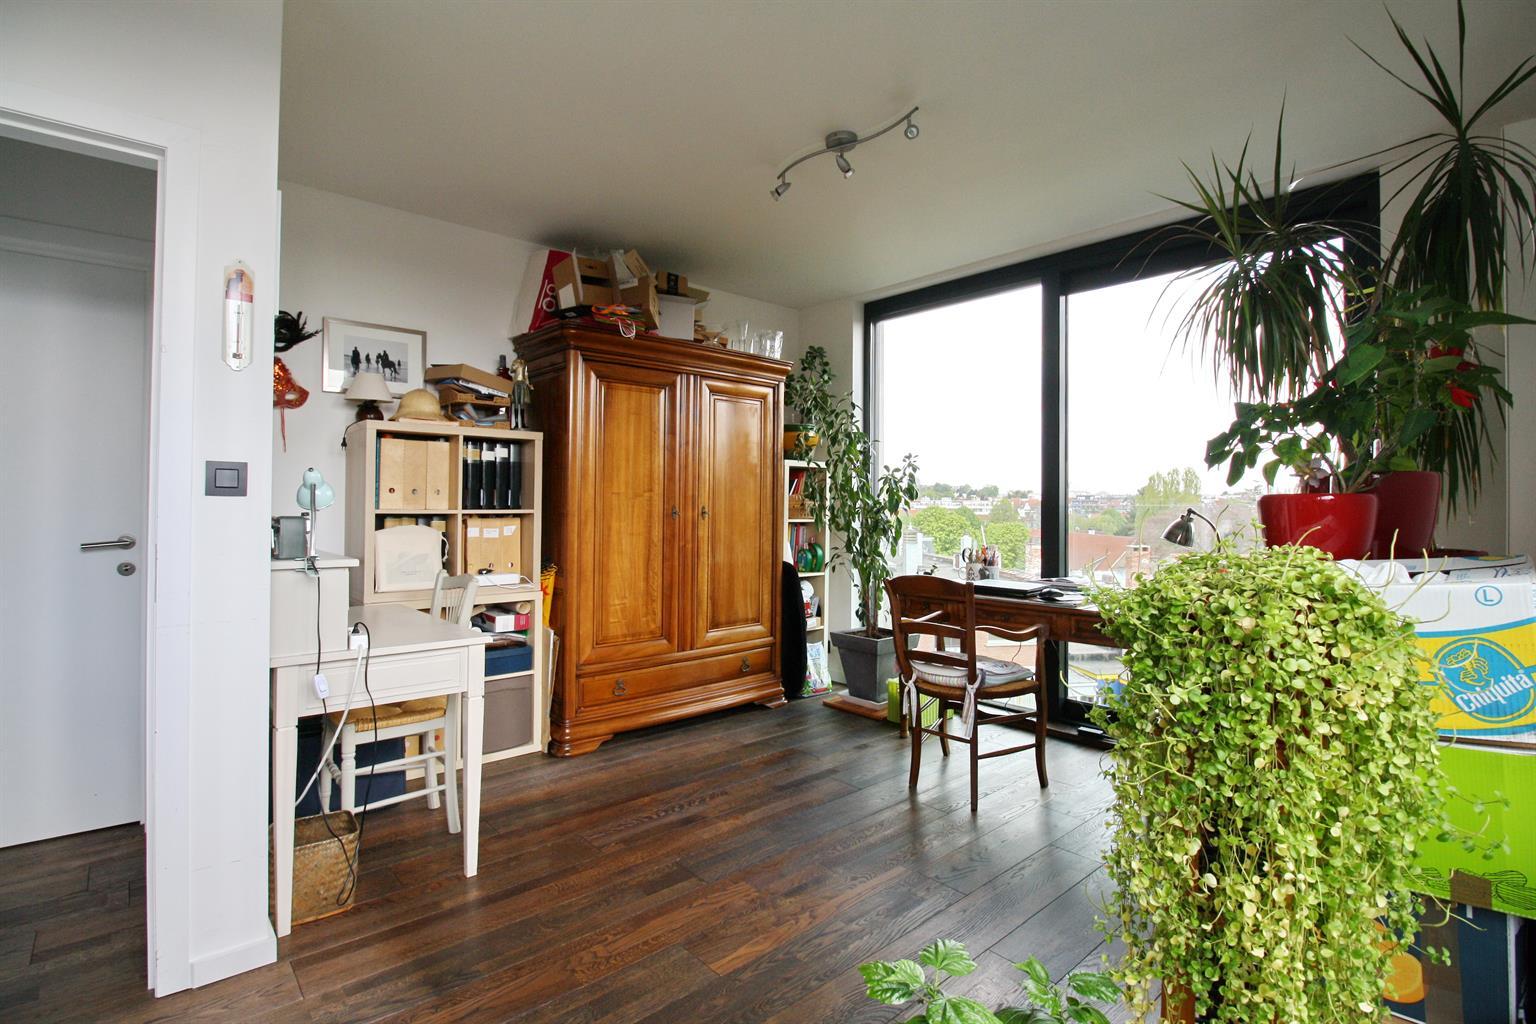 Penthouse - Berchem-Sainte-Agathe - #4346071-18